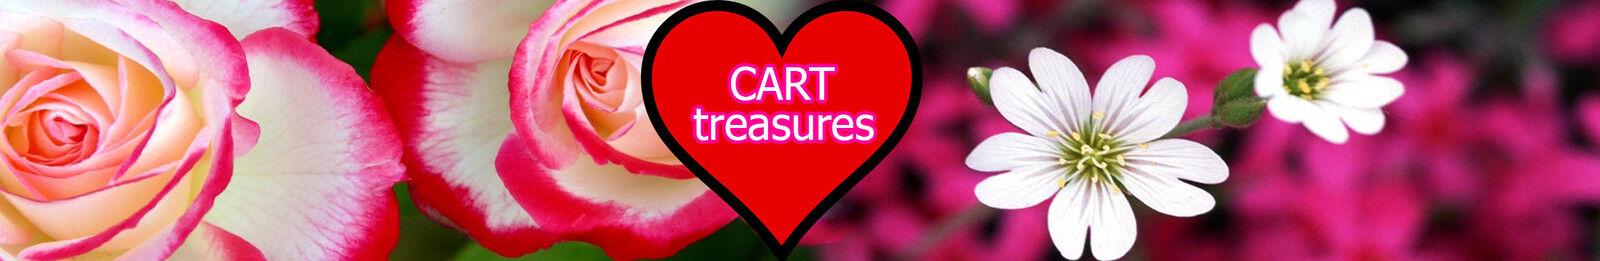 CARTtreasures